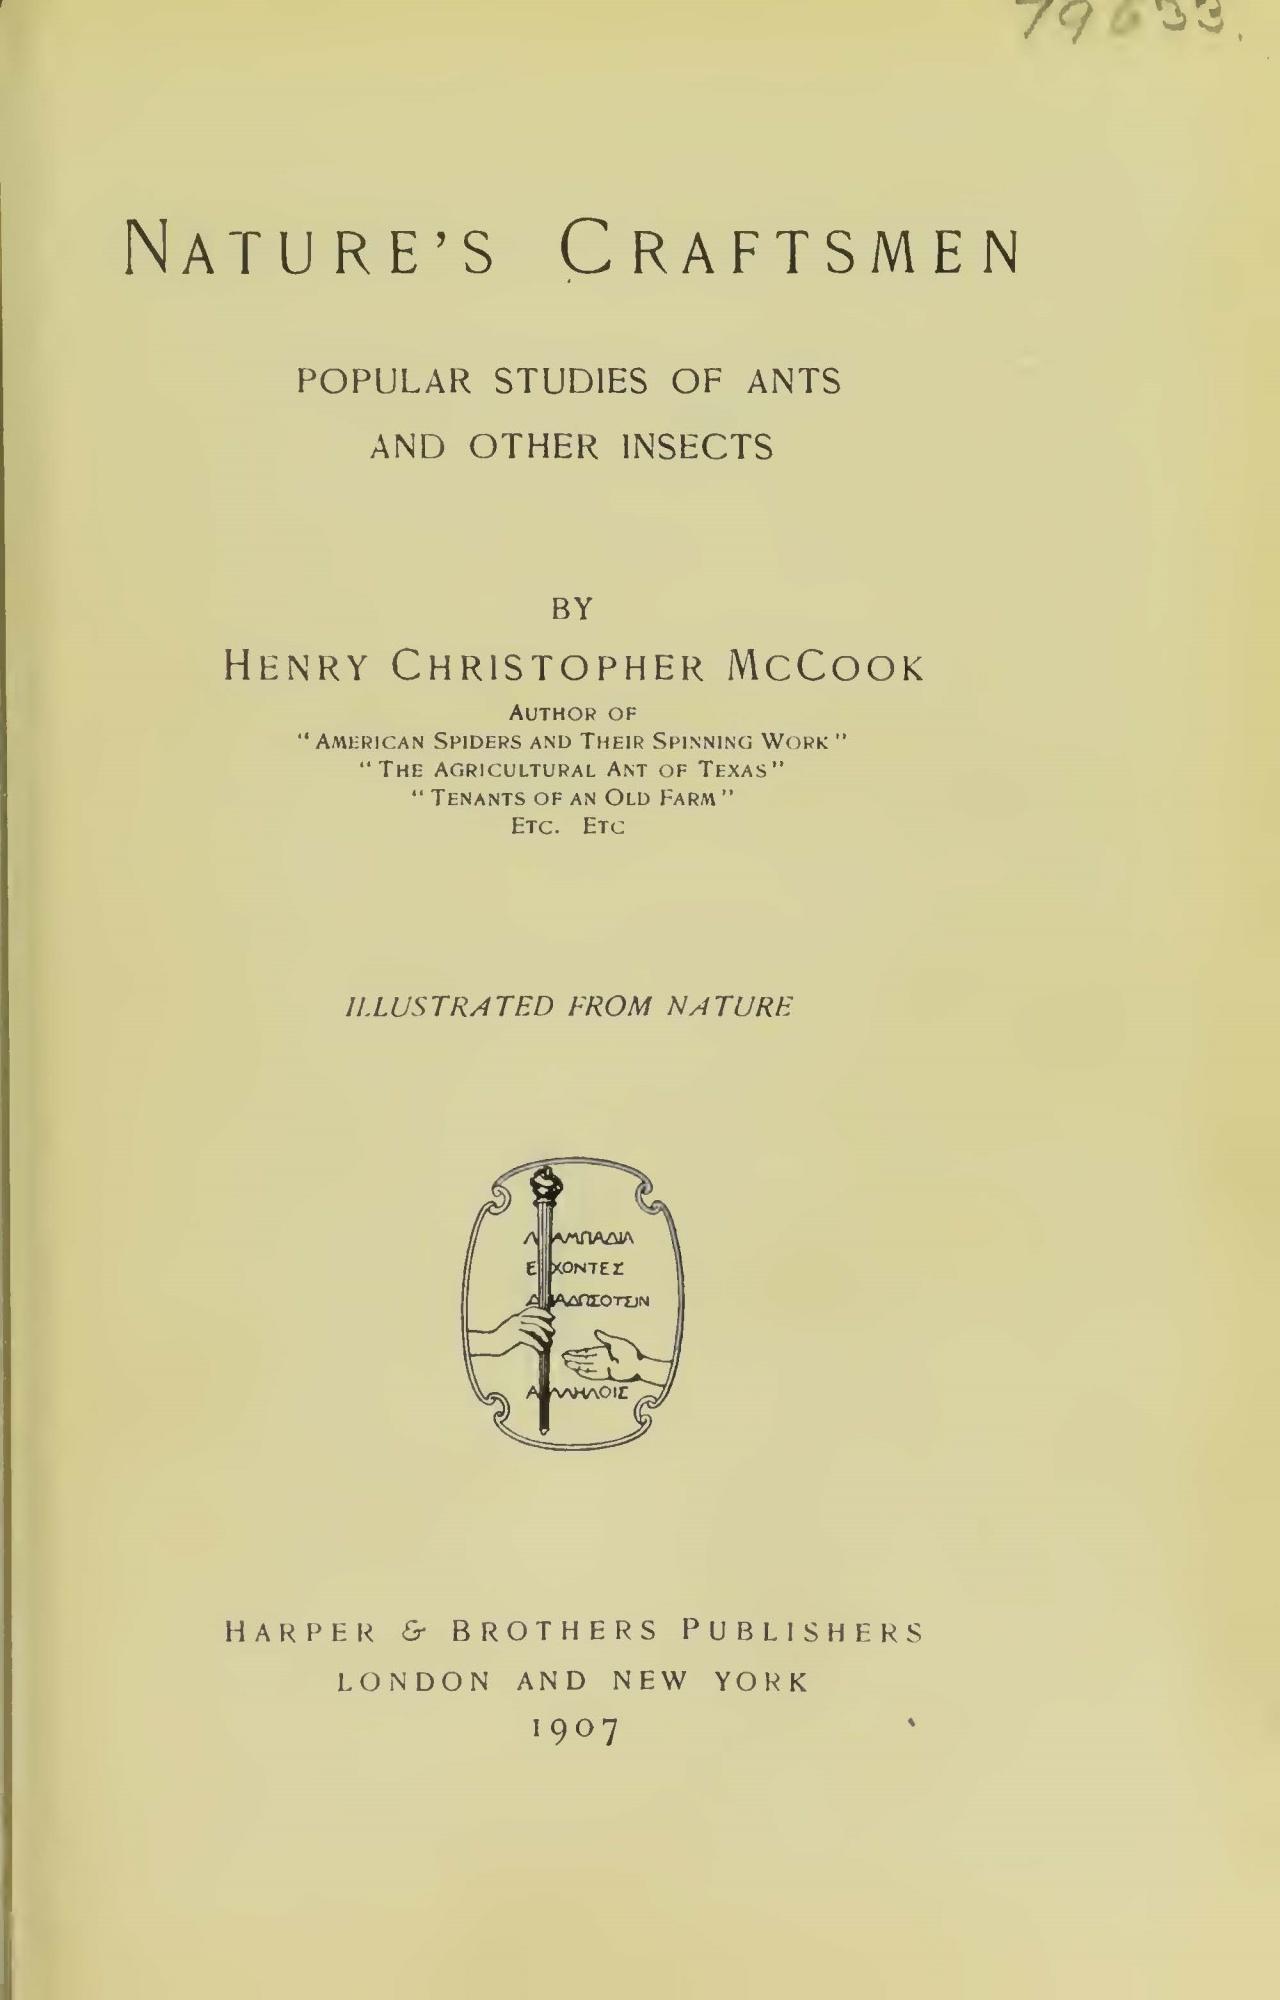 McCook, Henry Christopher, Nature's Craftsmen Title Page.jpg